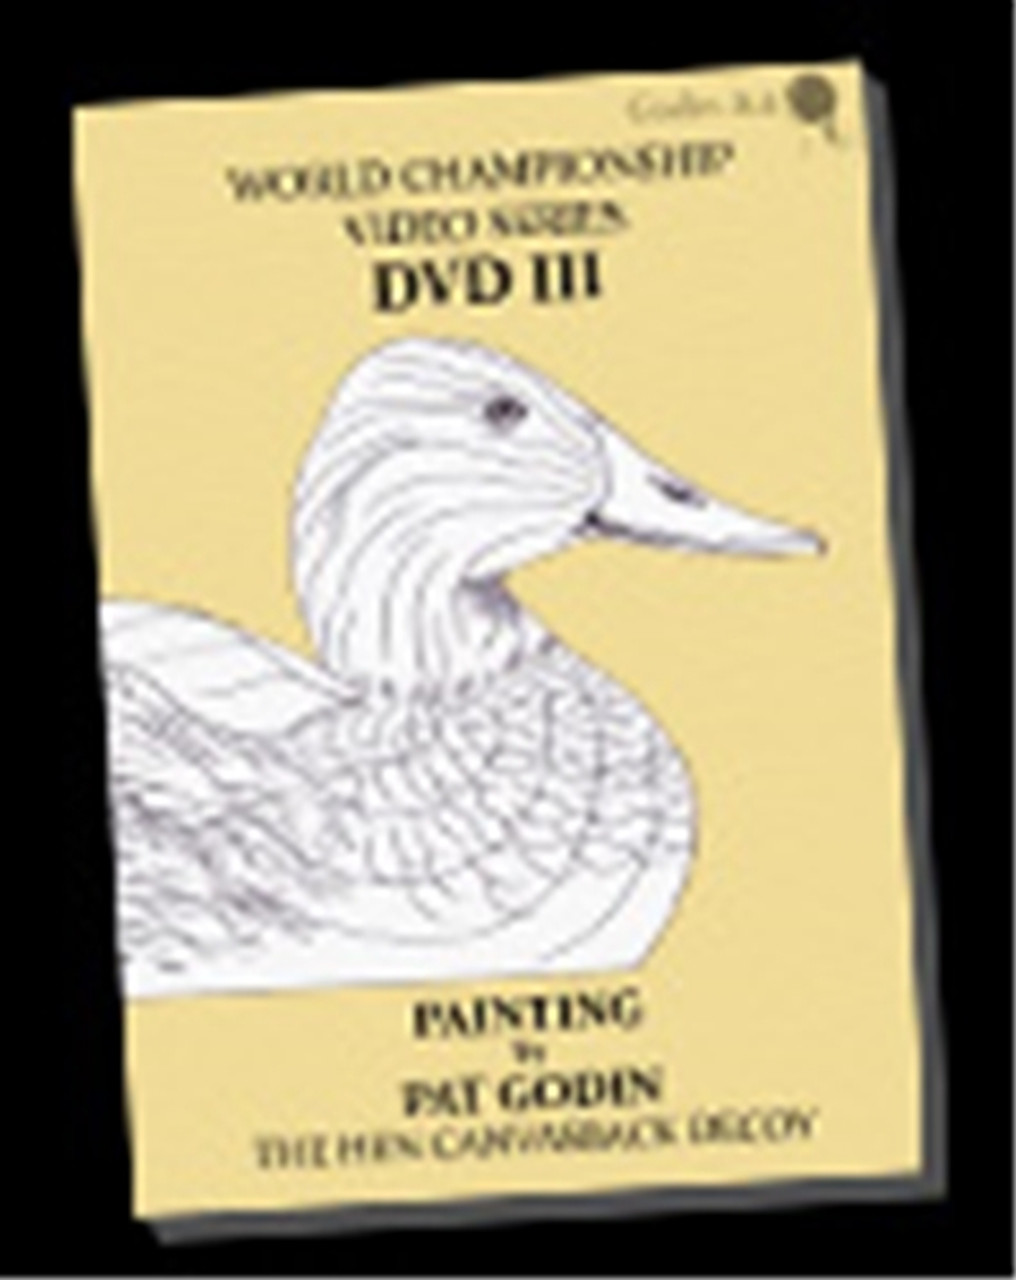 Championship Video Series: Painting DVD